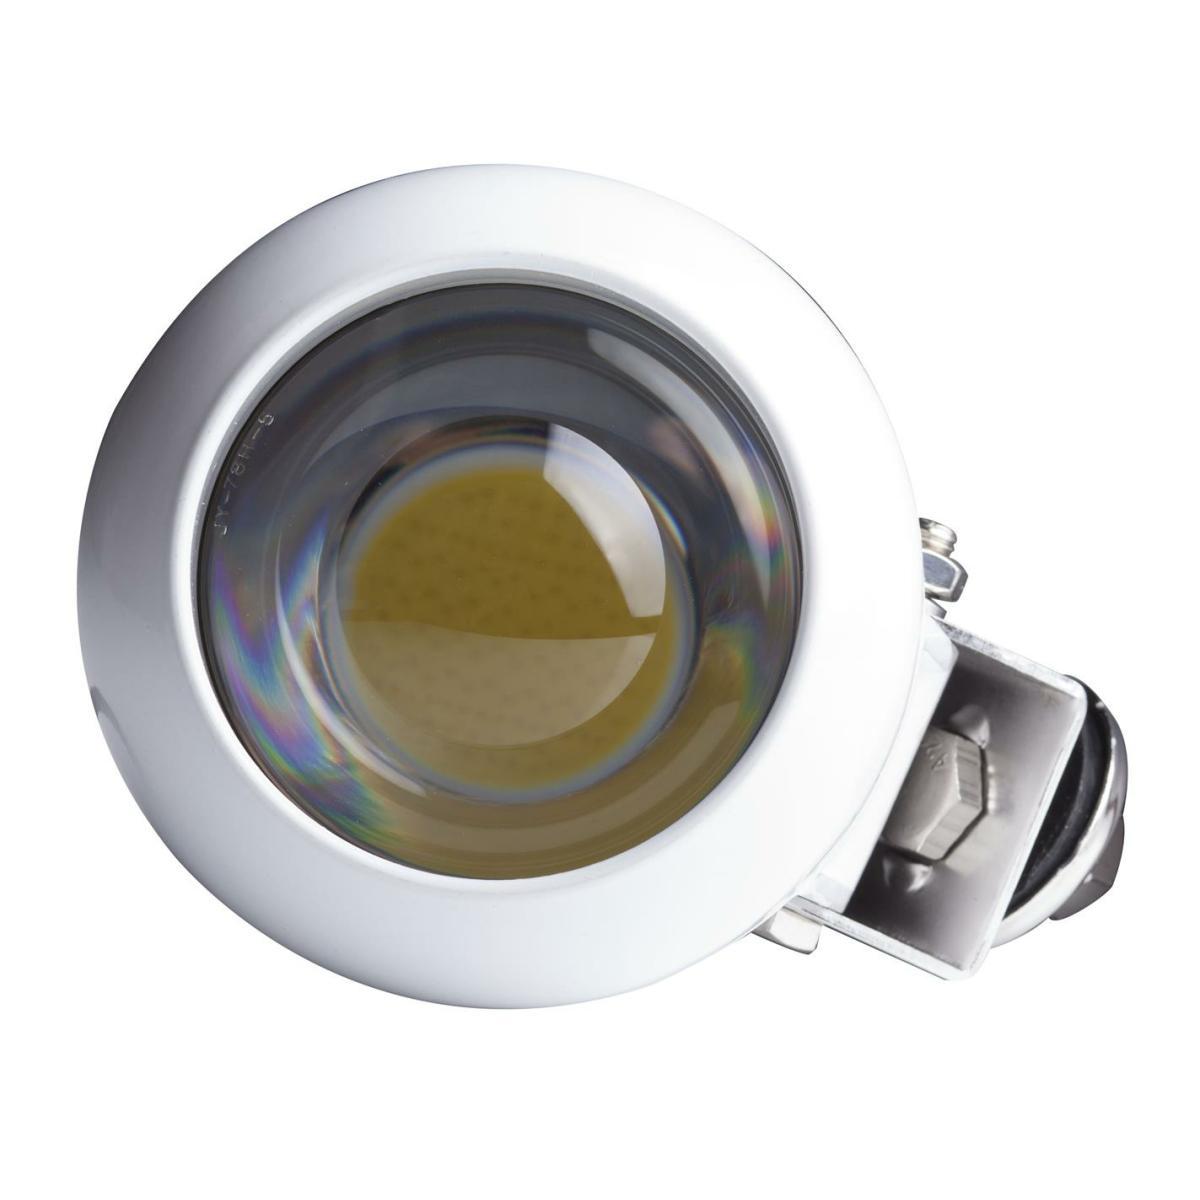 LED worklight LY8020 5.5 12V 24V 20W IP67 round white